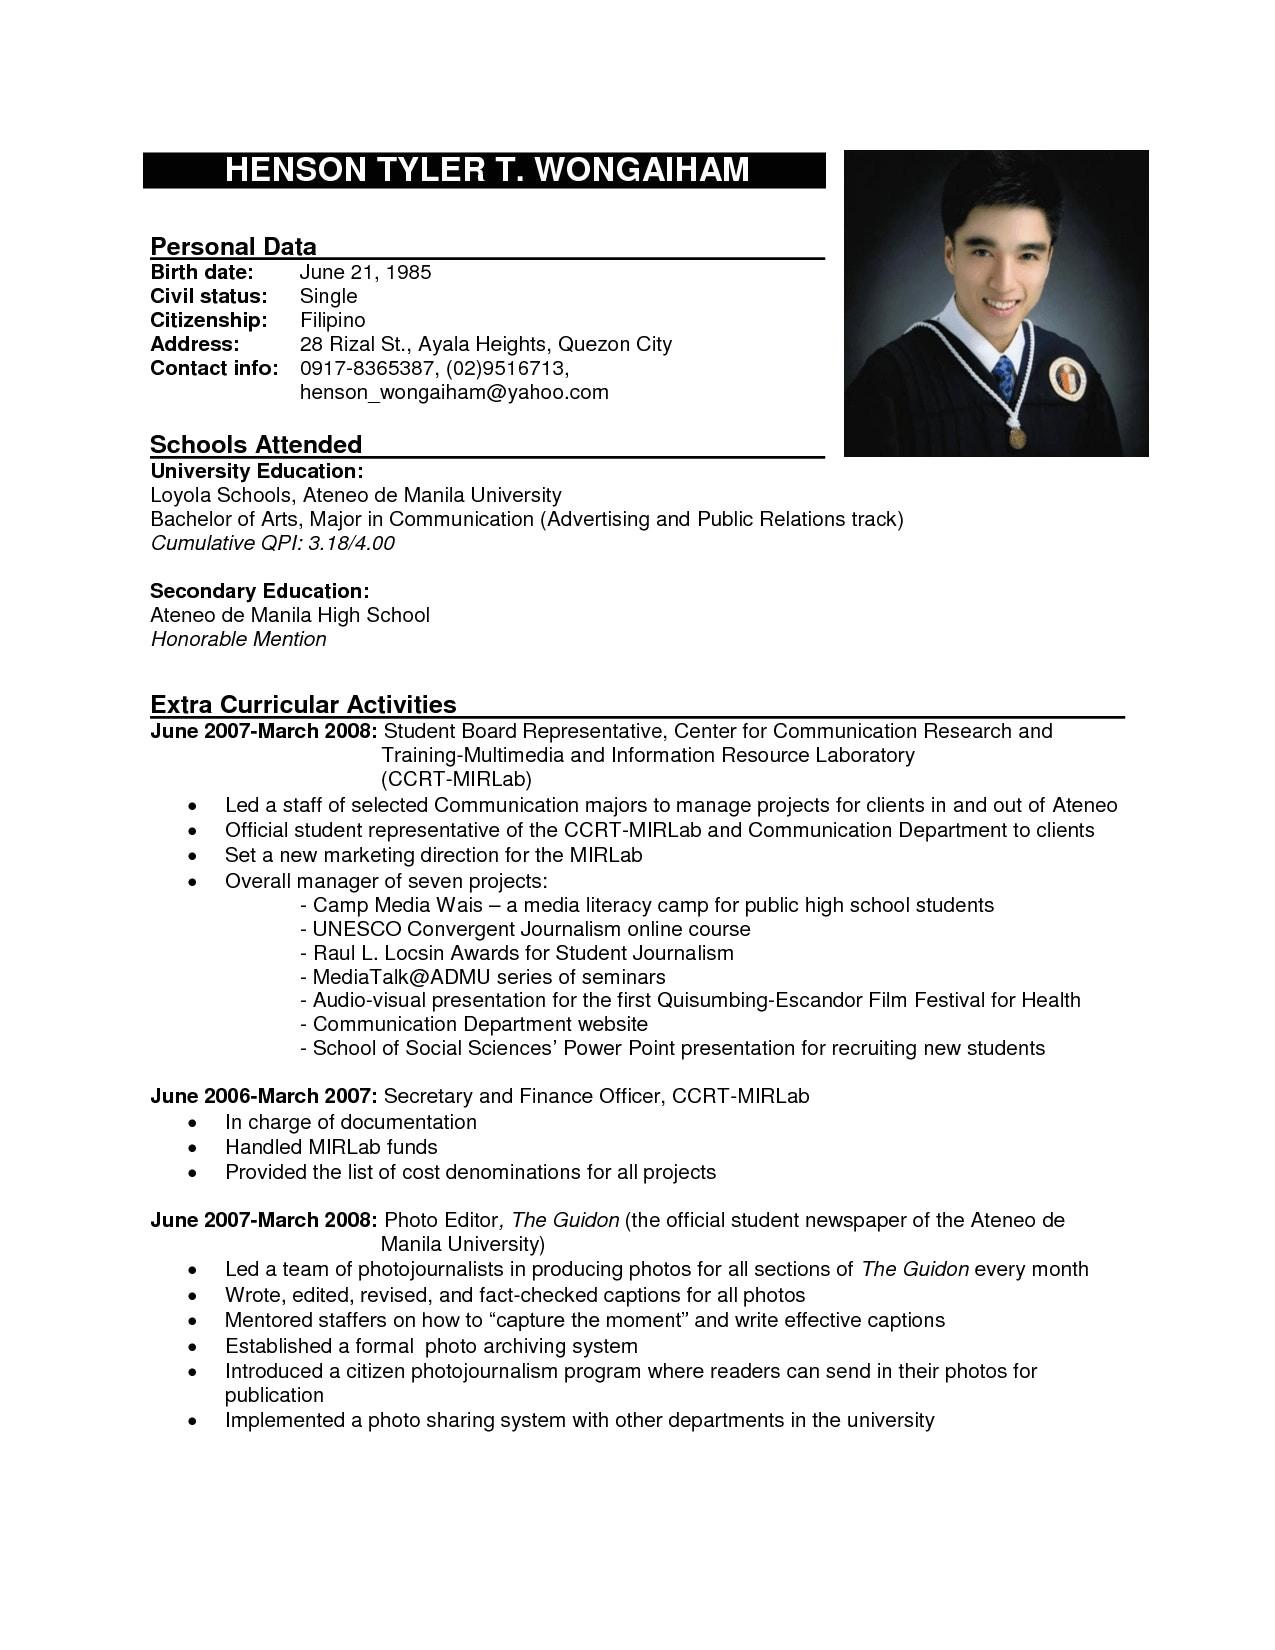 12 example of job applying resume